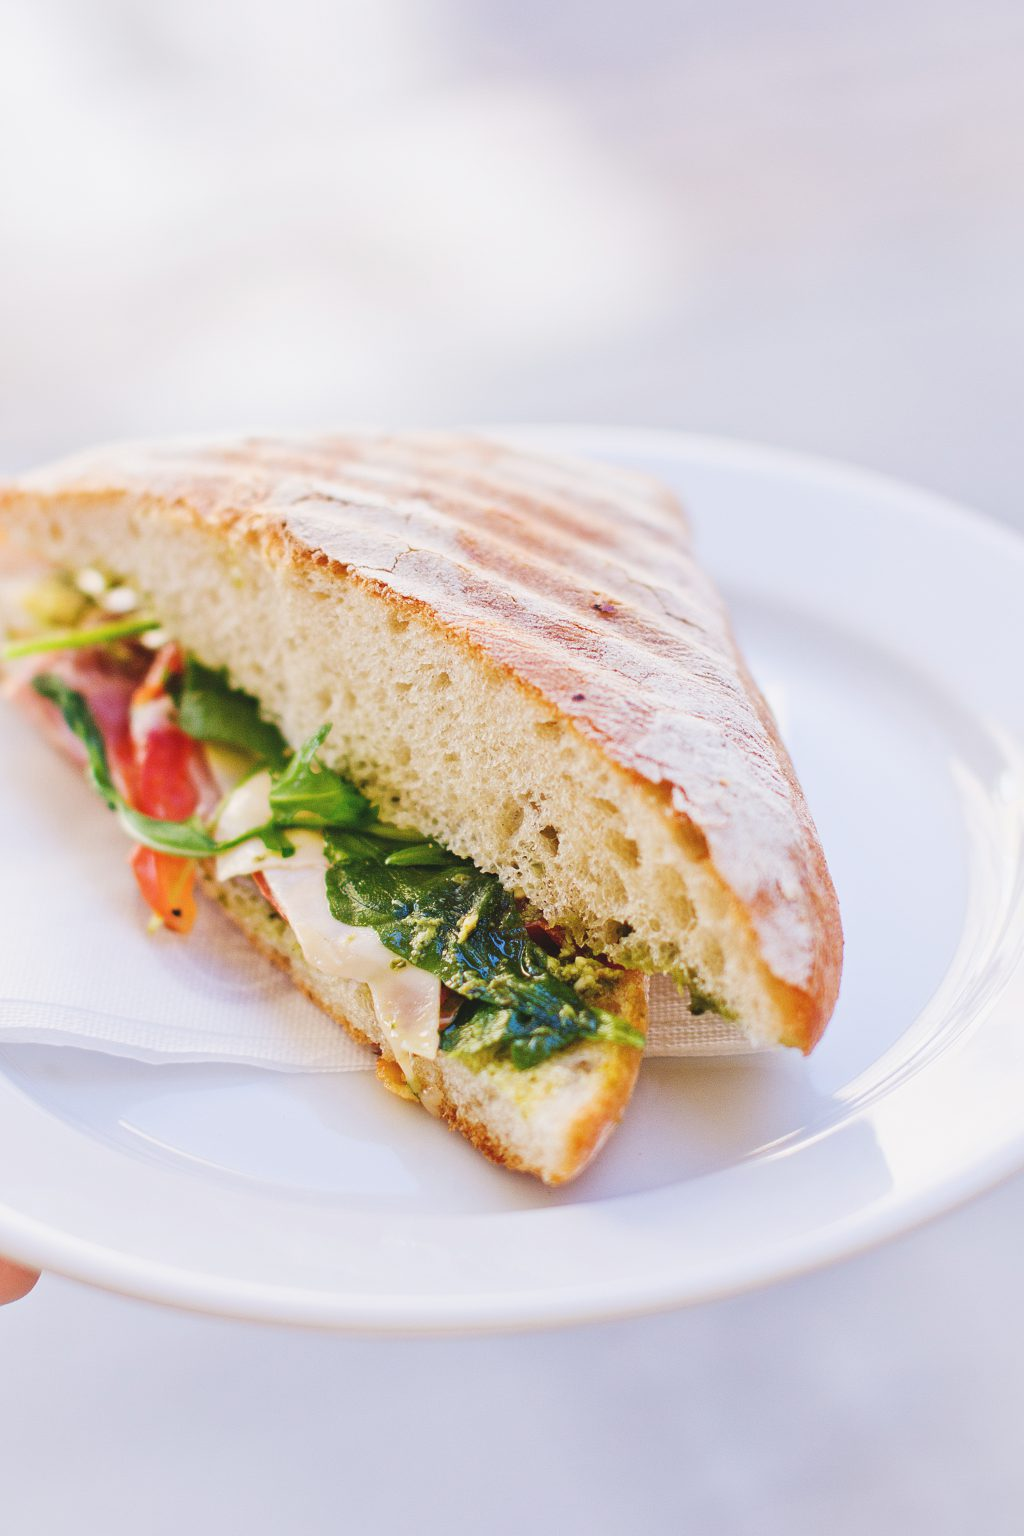 Sandwich - free stock photo